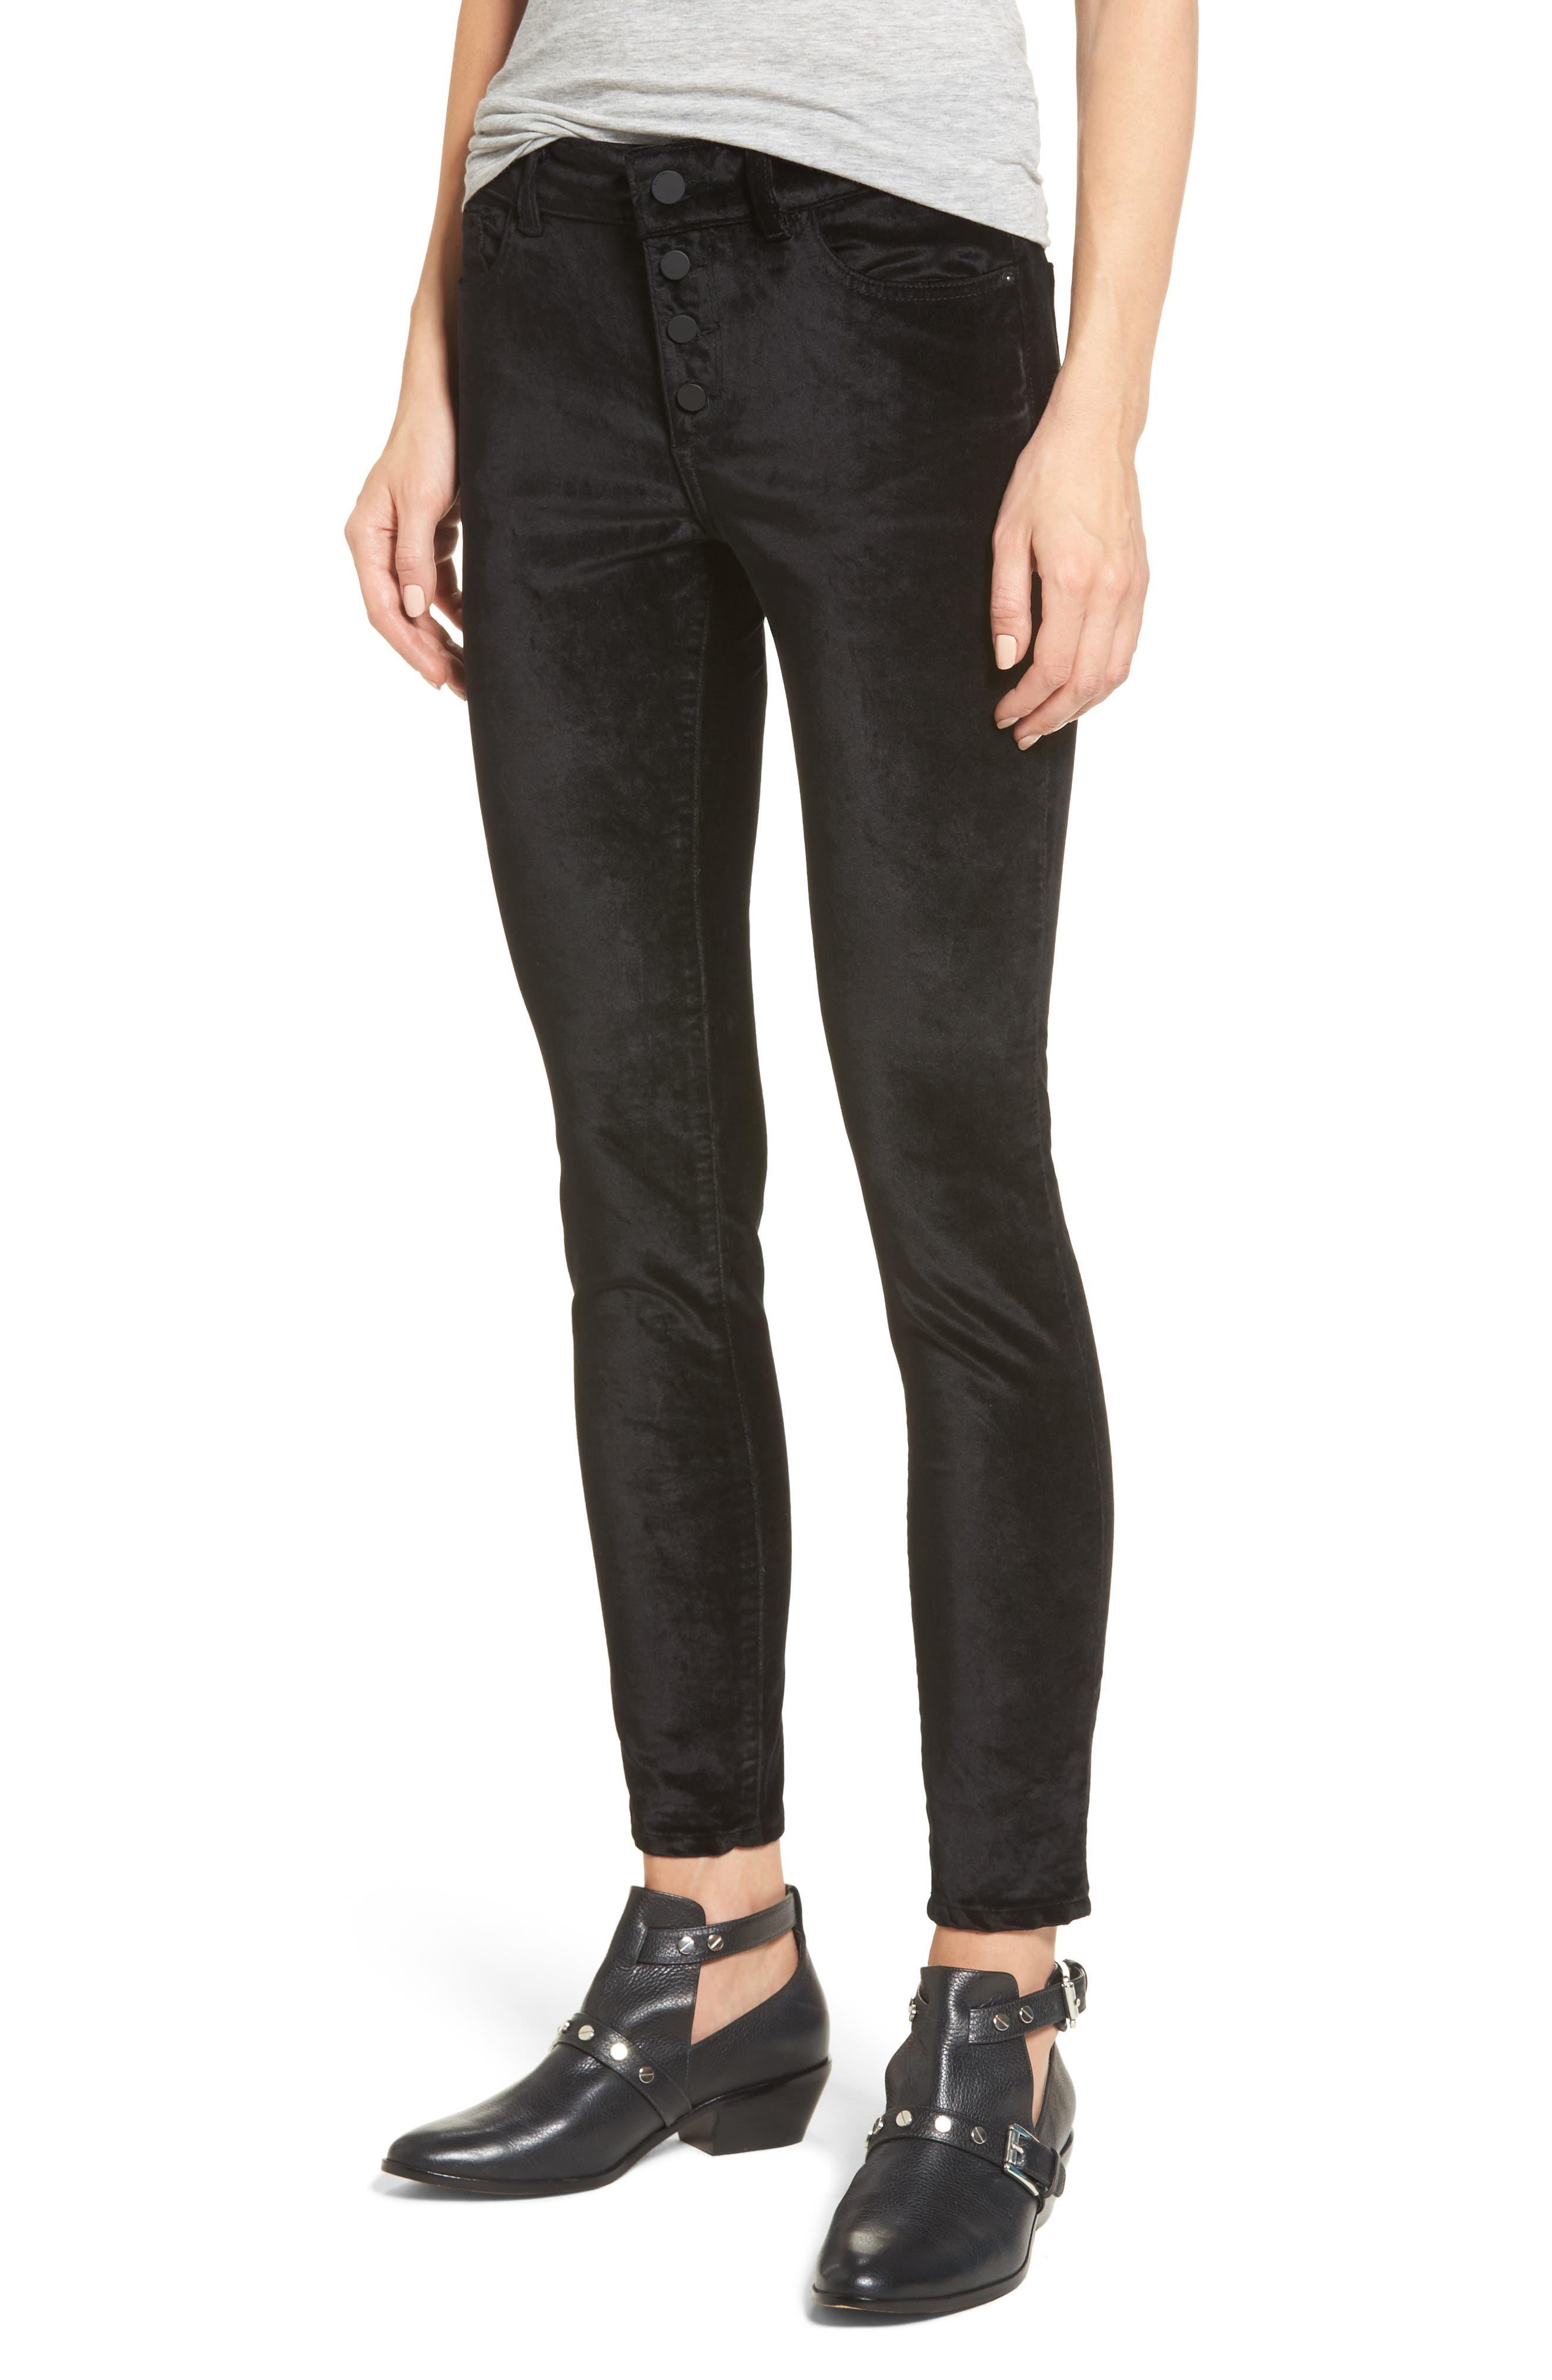 DL1961 Emma Power Legging Jeans (Jet Black)